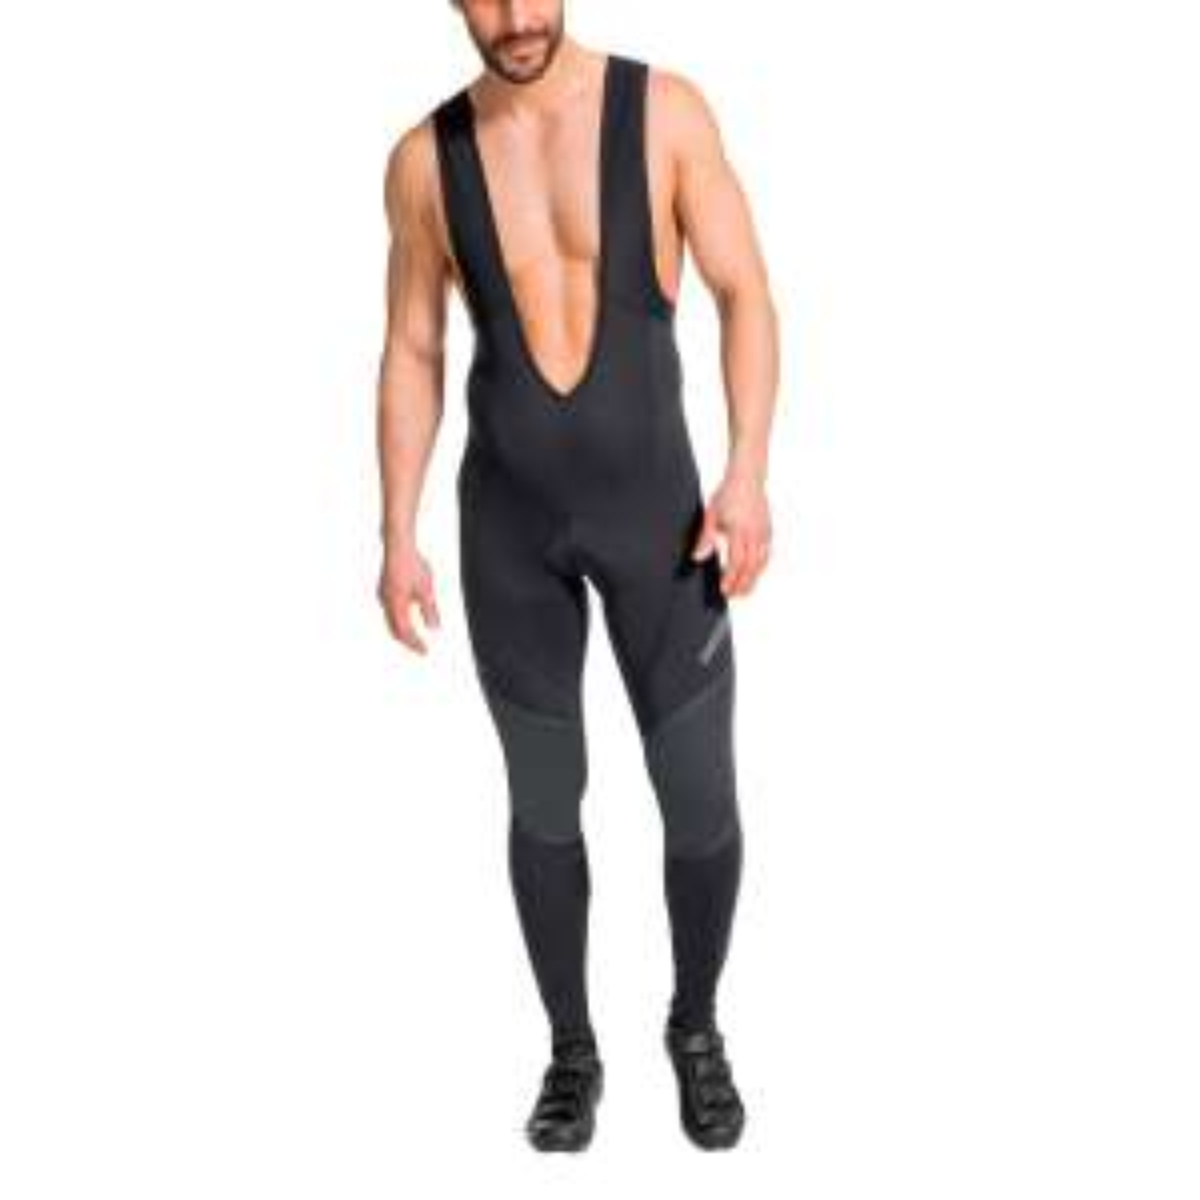 VAUDE Men's Active Warm Pants W/O Sc £16.80 Prime / £21.29 Non Prime